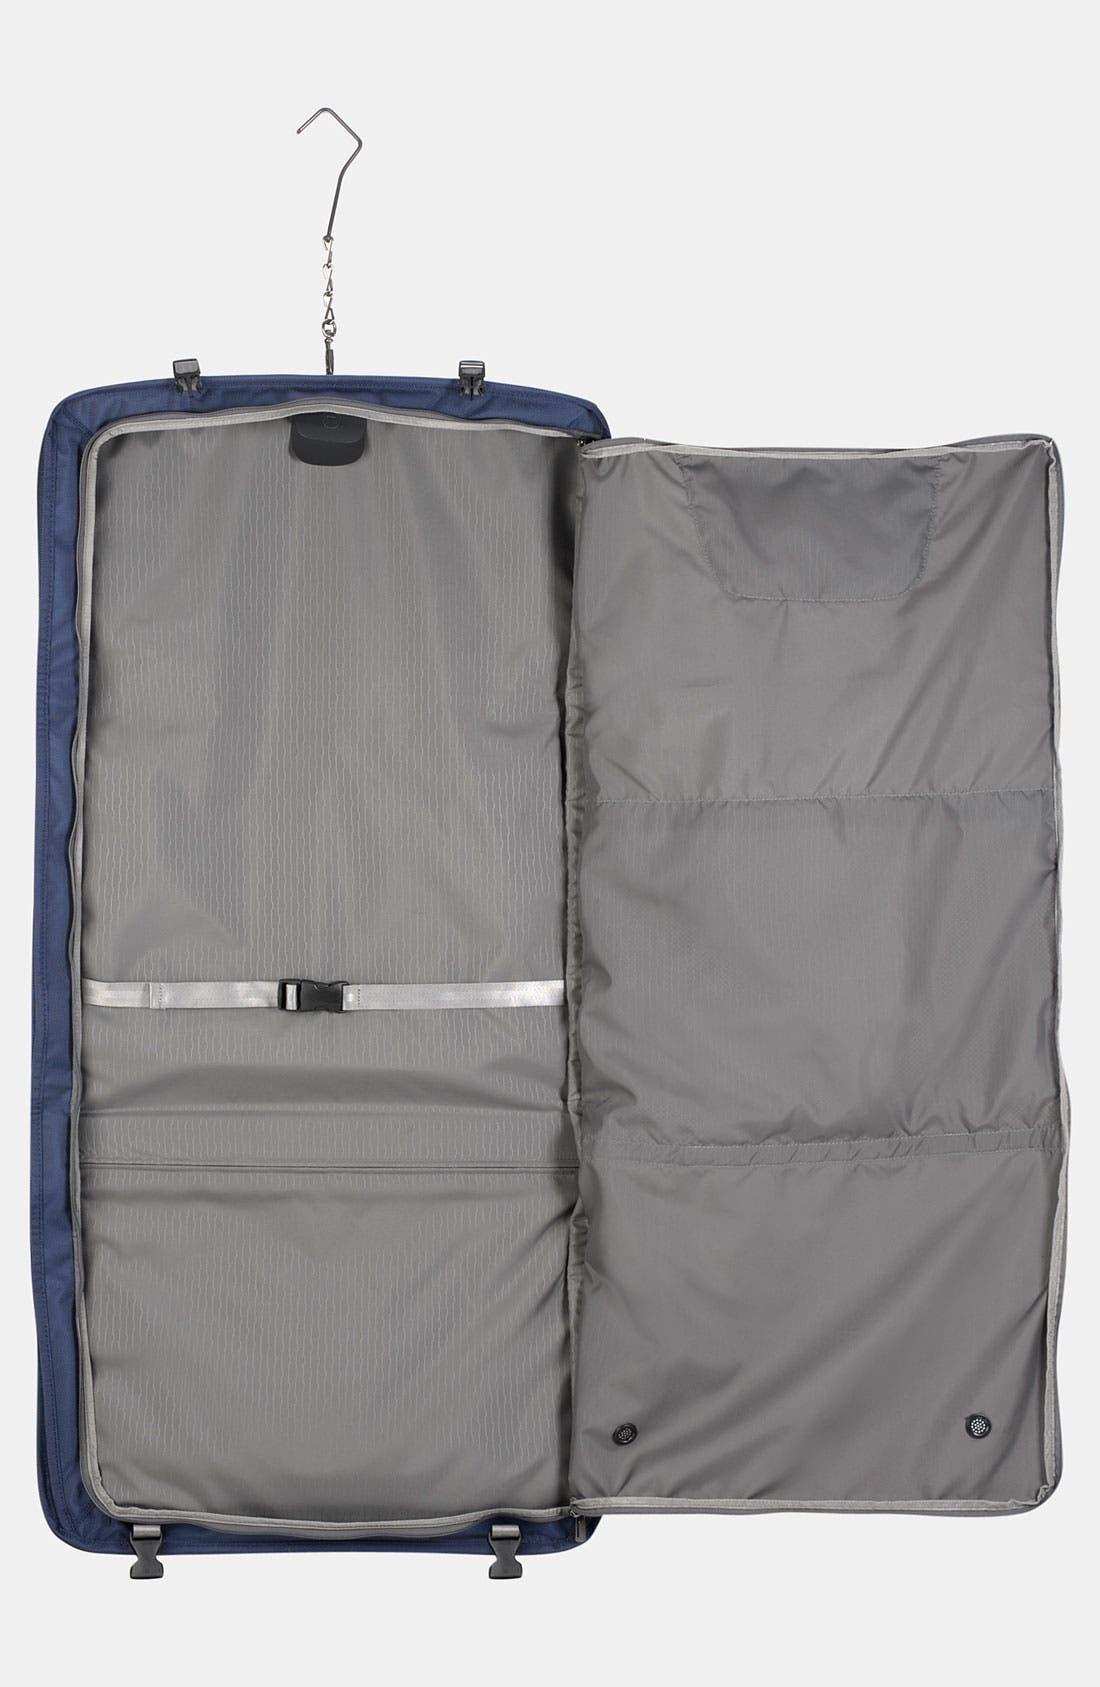 Alternate Image 2  - T-Tech by Tumi 'Presidio Kobbe' Trifold Garment Bag